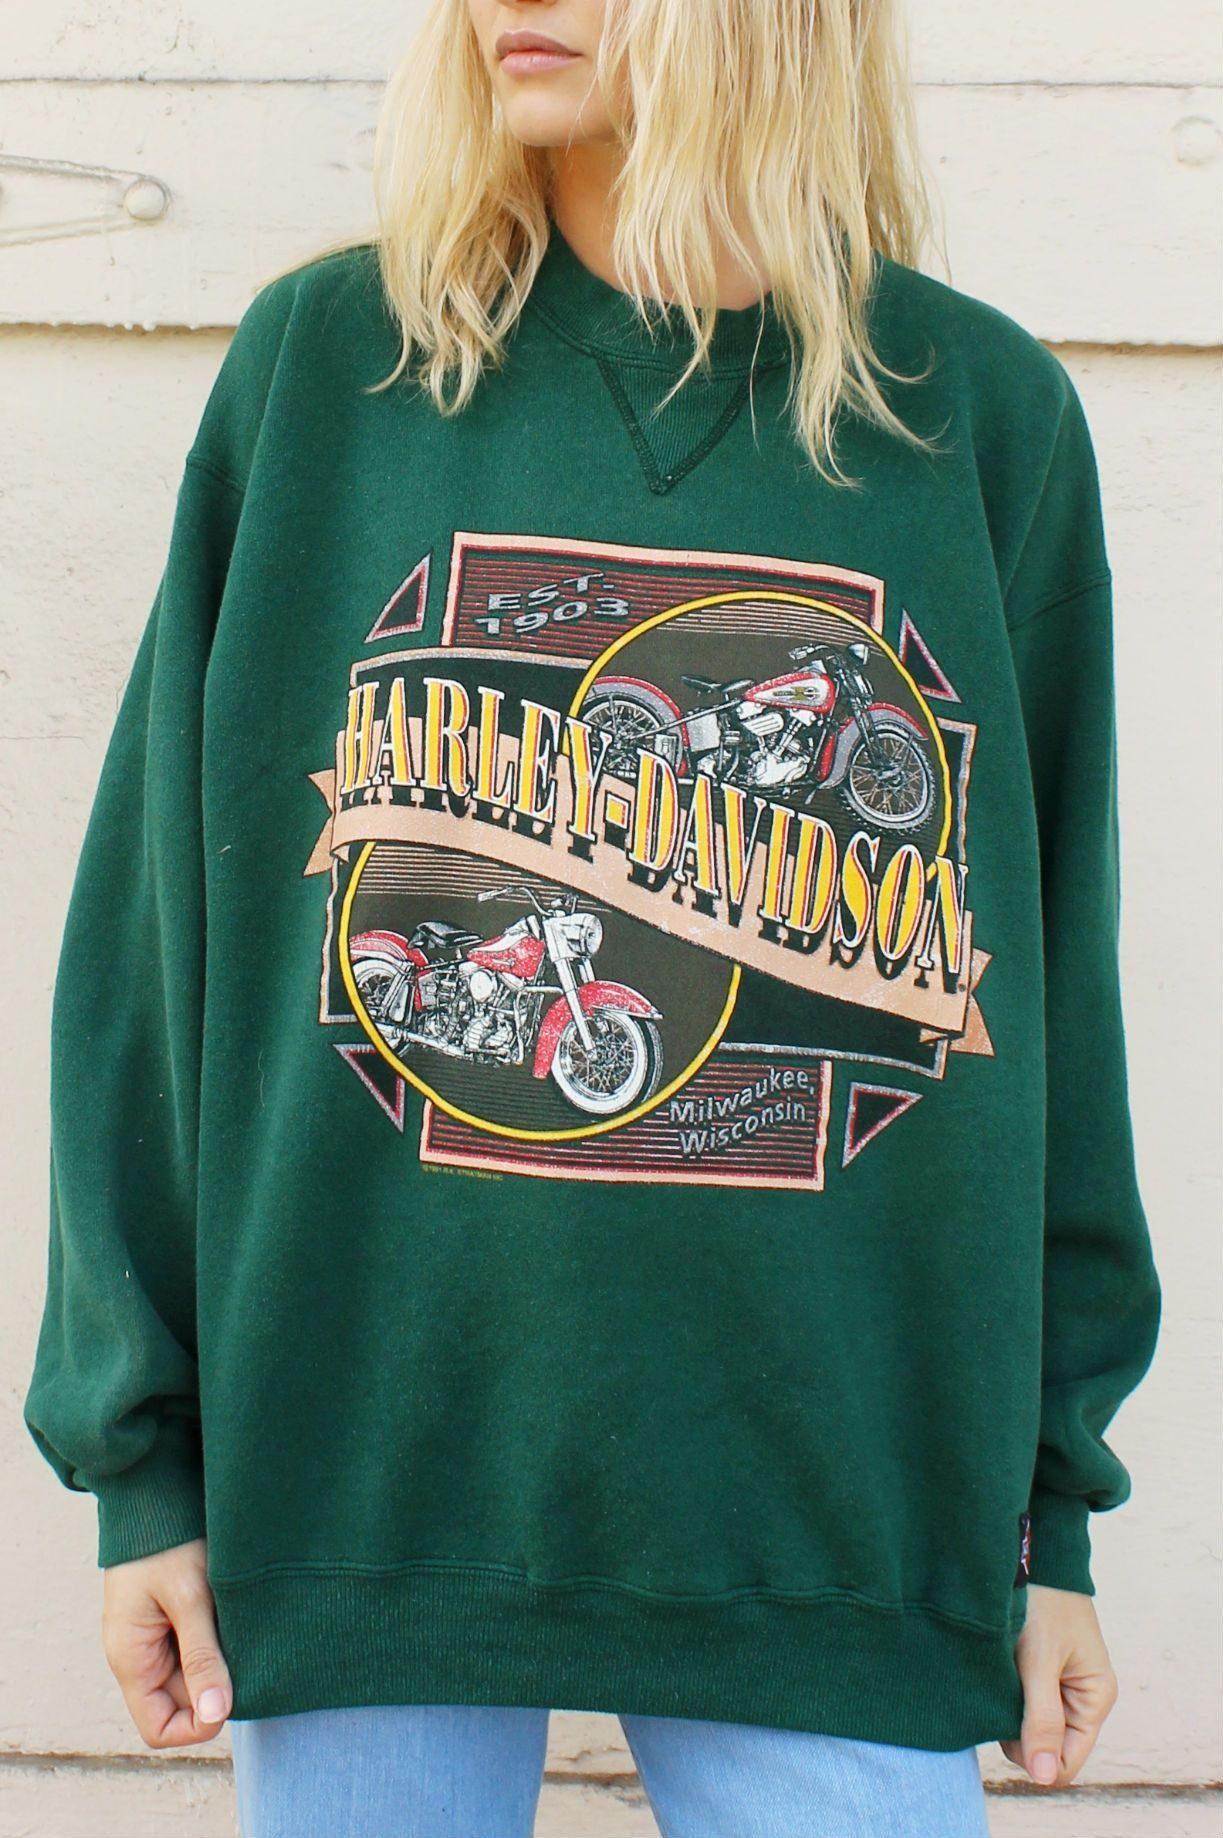 north texas vintage harley davidson sweatshirt | products